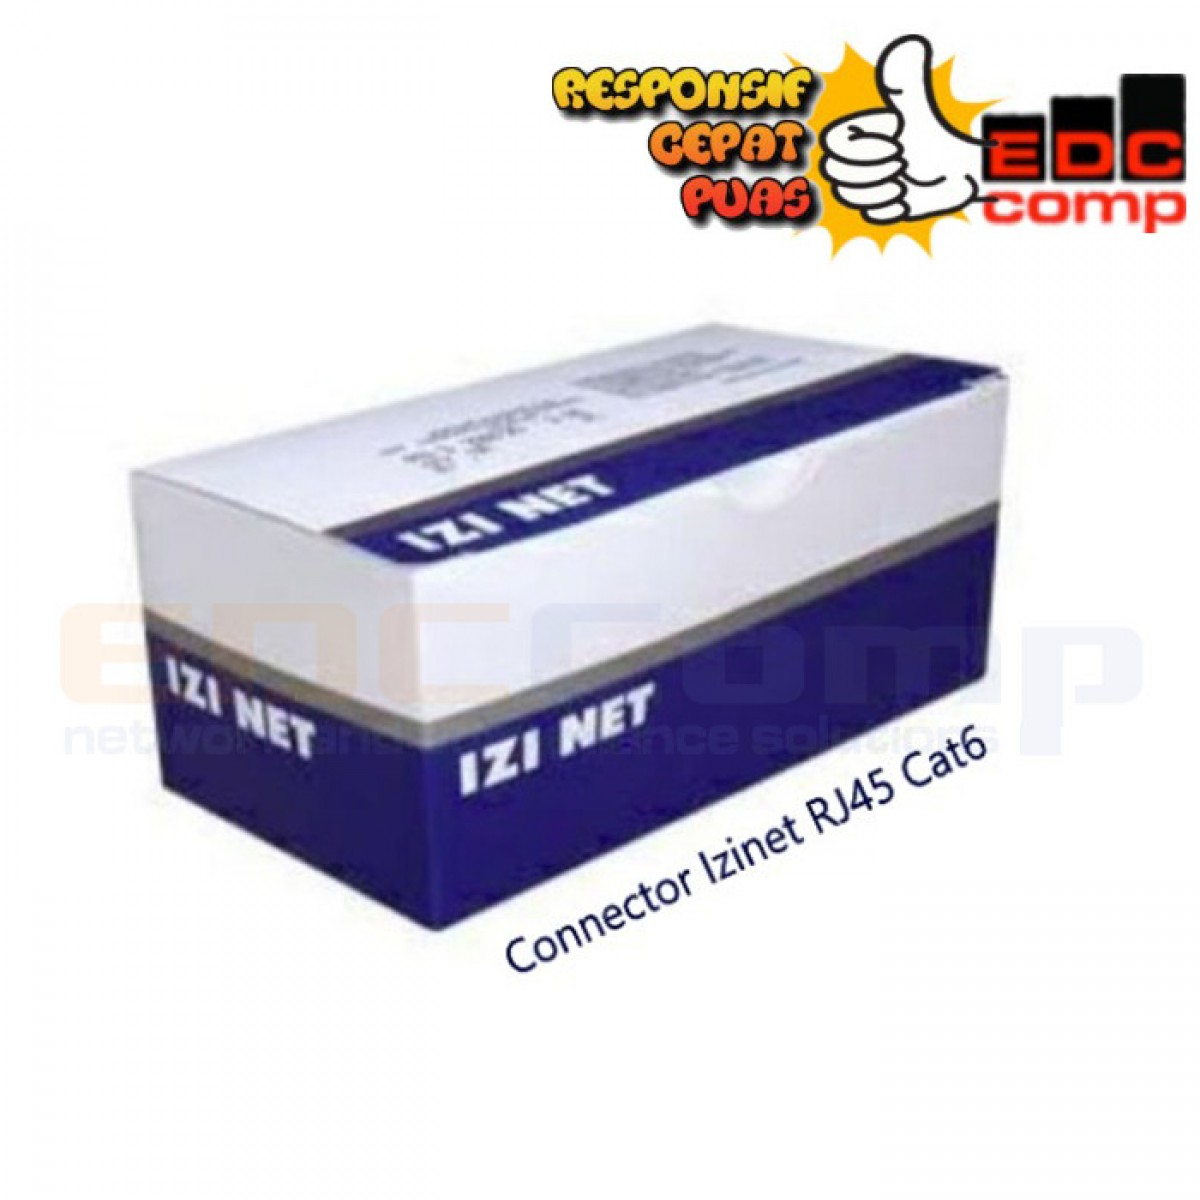 Connector IZINET RJ45 FTP / STP Cat 6 Original - EdcComp